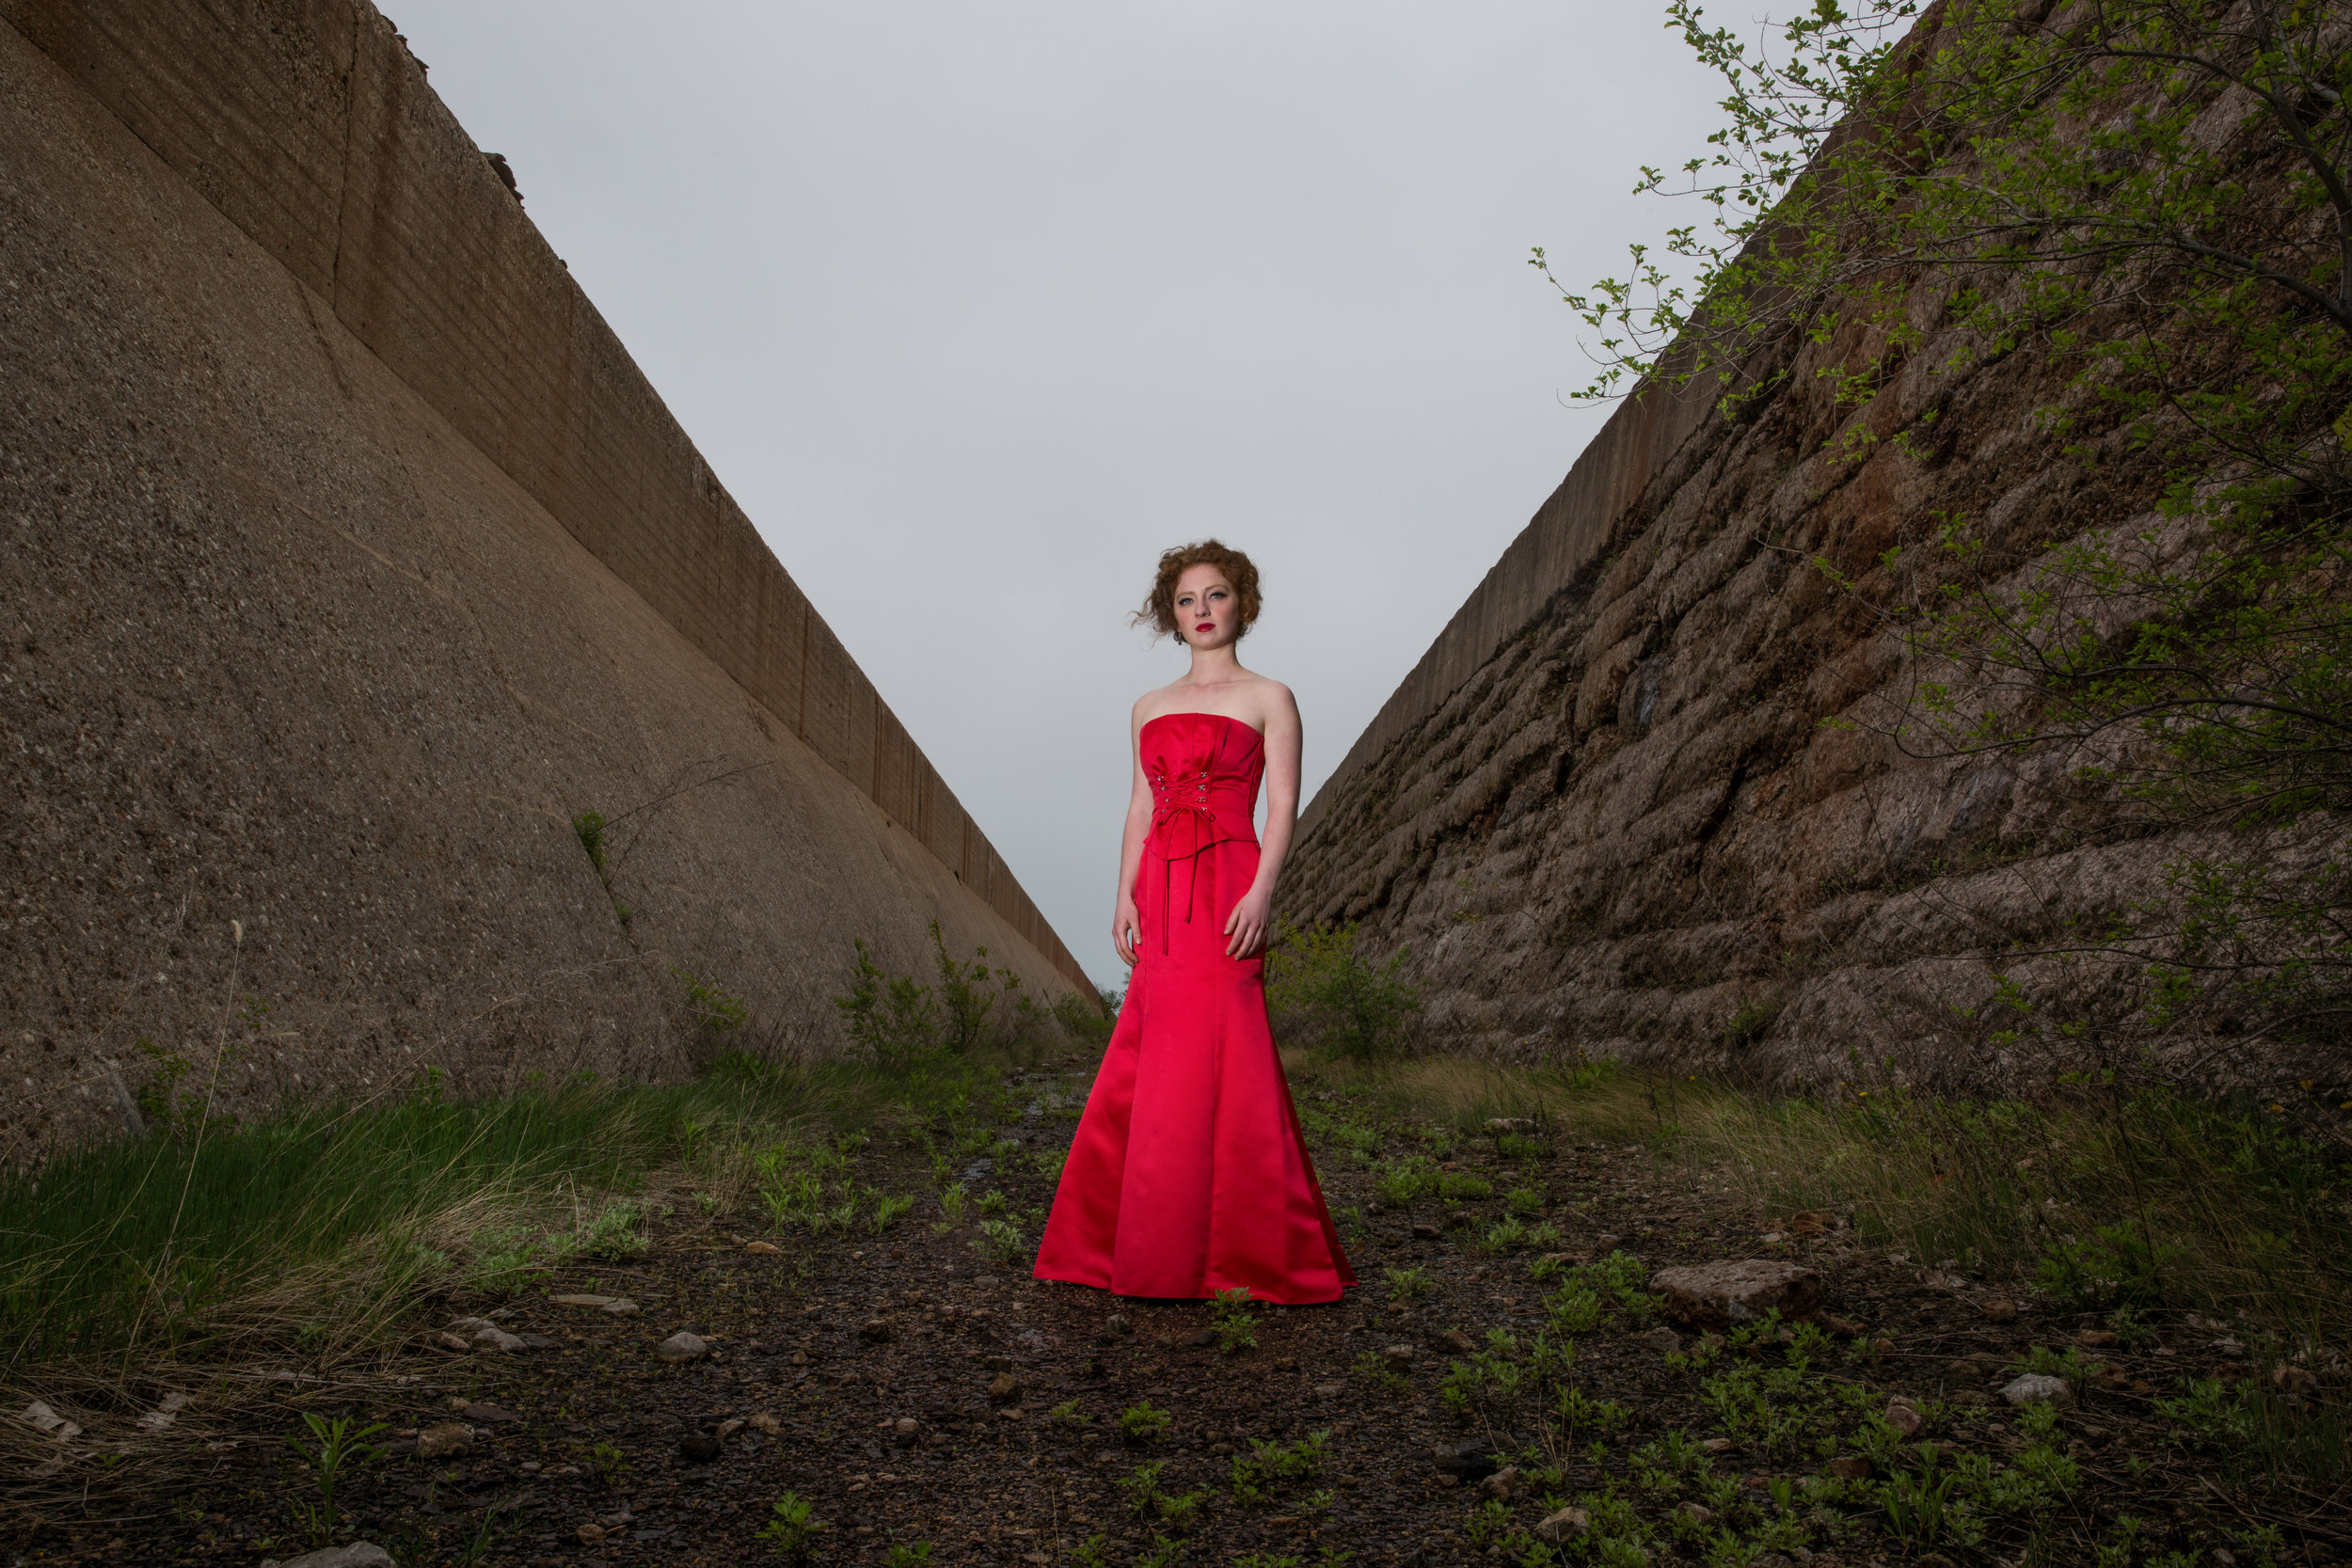 S red dress.jpg